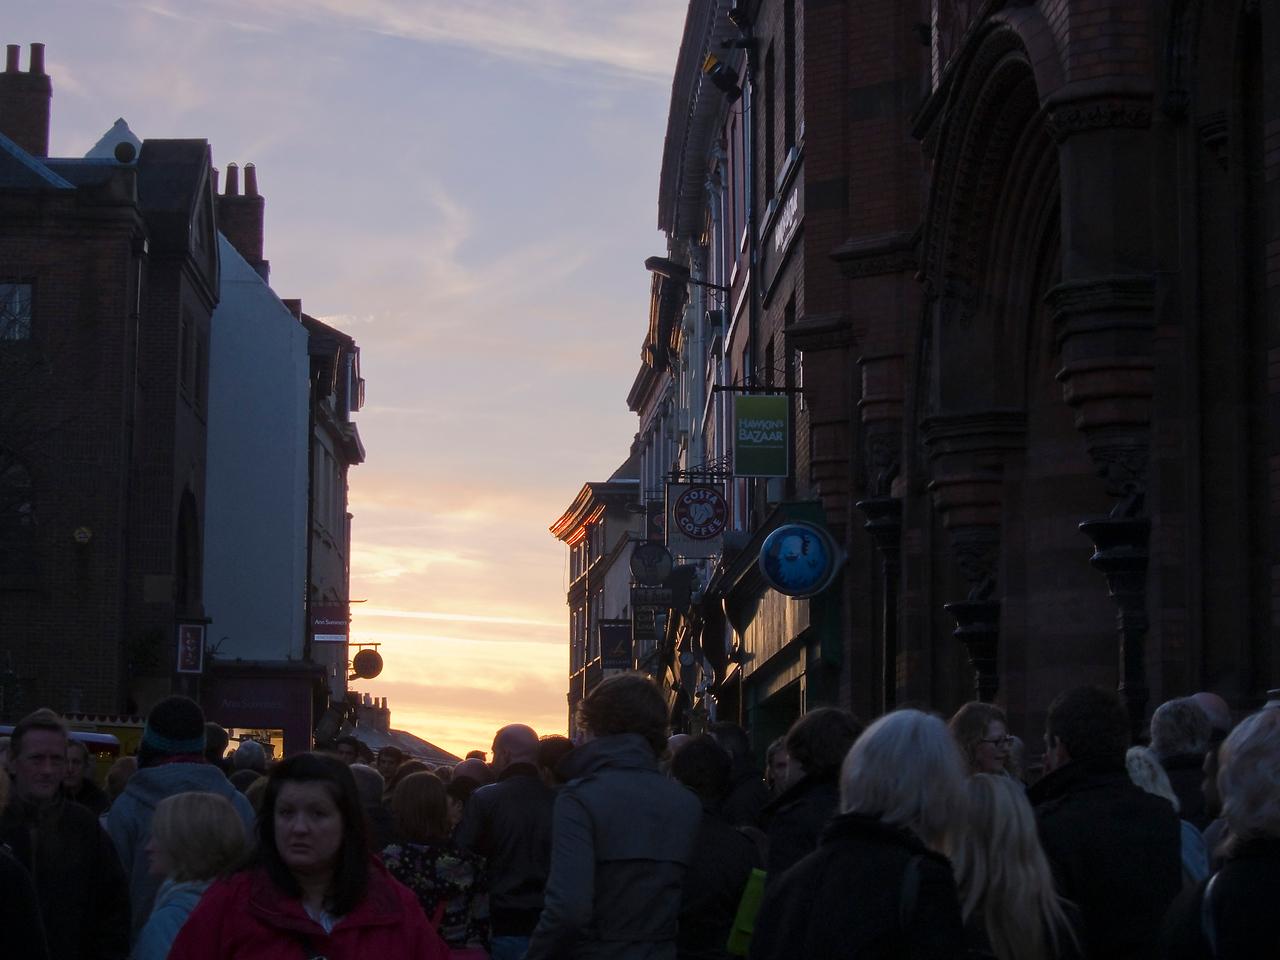 Christmas shoppers throng a York street